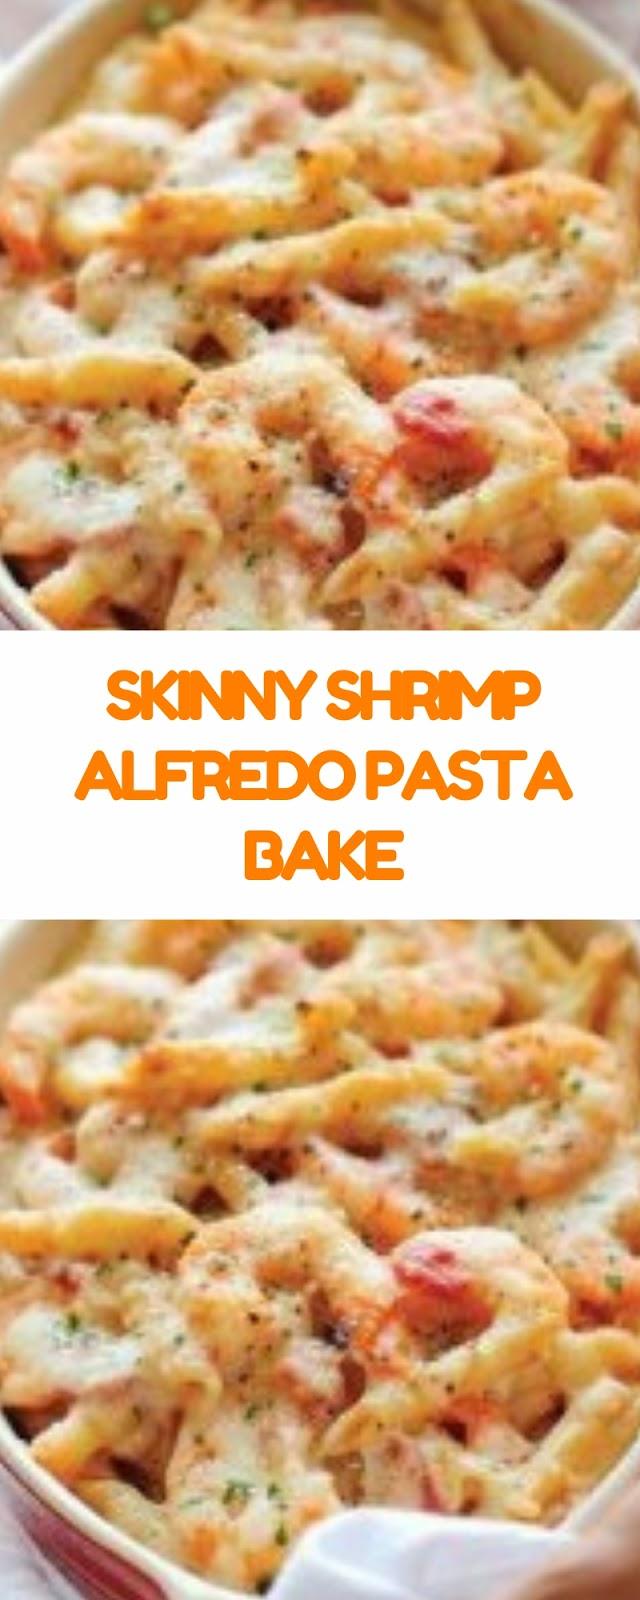 SKINNY SHRIMP ALFREDO PASTA BAKE